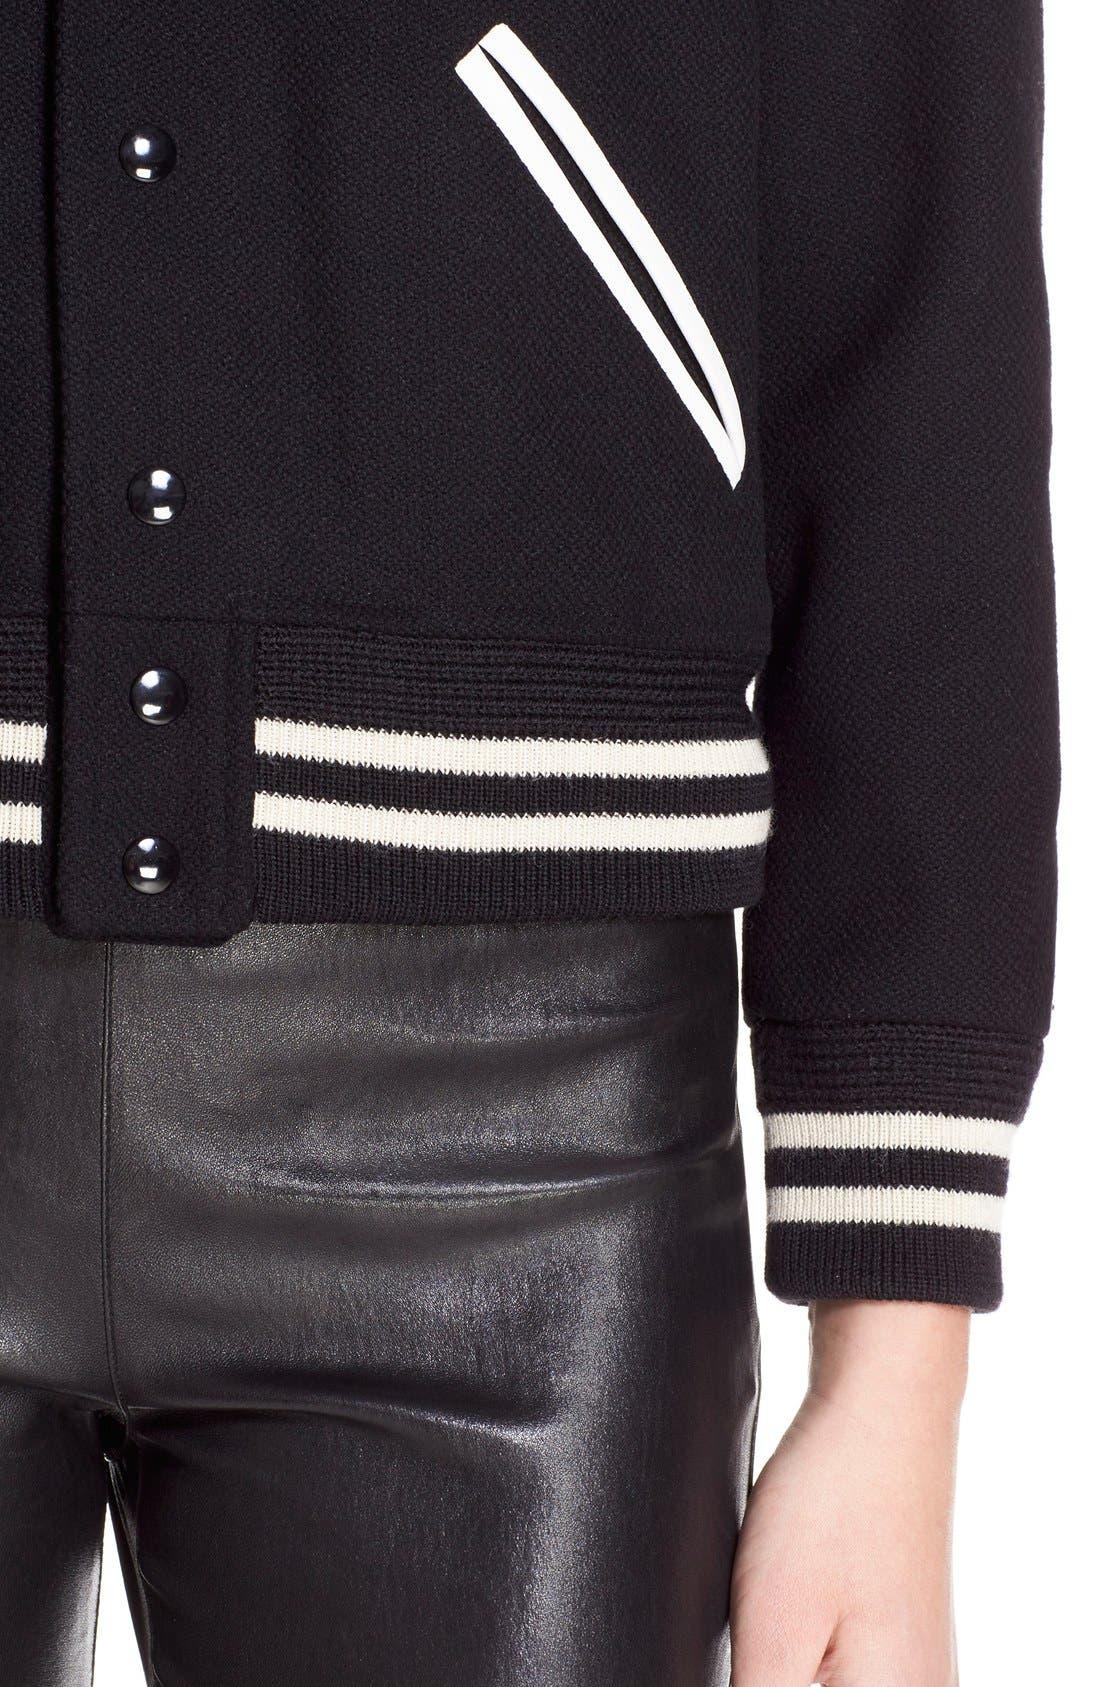 'Teddy' White Leather Trim Bomber Jacket,                             Alternate thumbnail 6, color,                             Black White